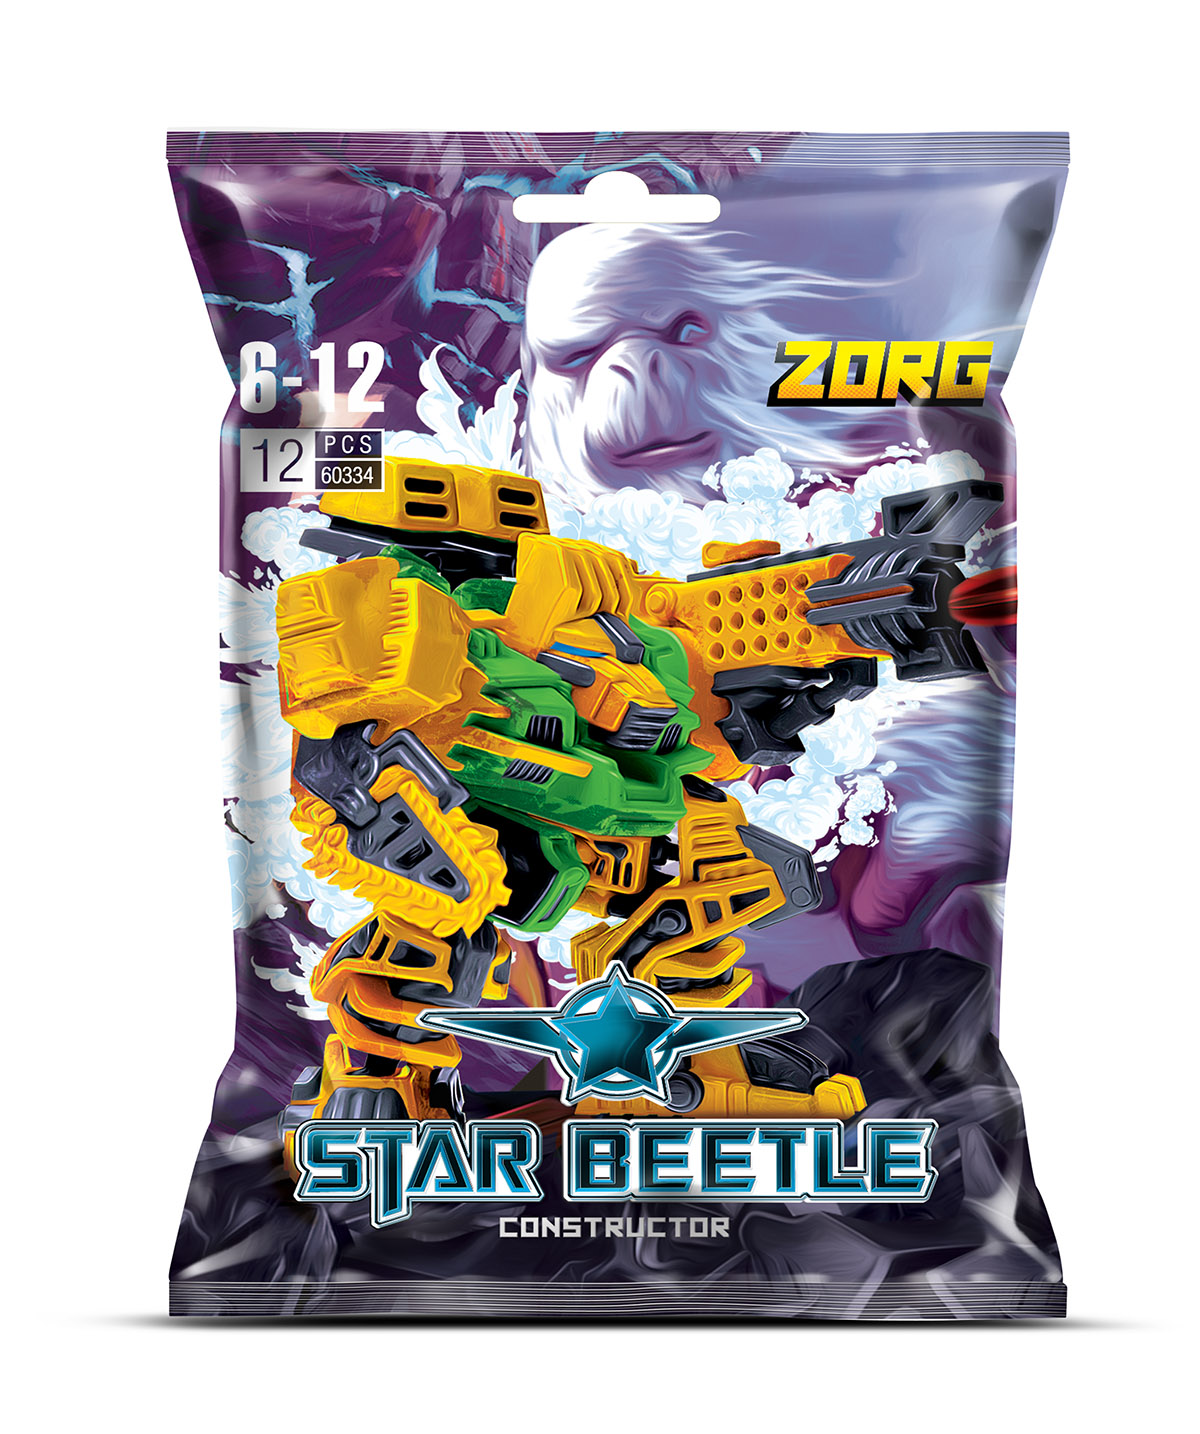 Zormaer Конструктор Star Beetle Zorg